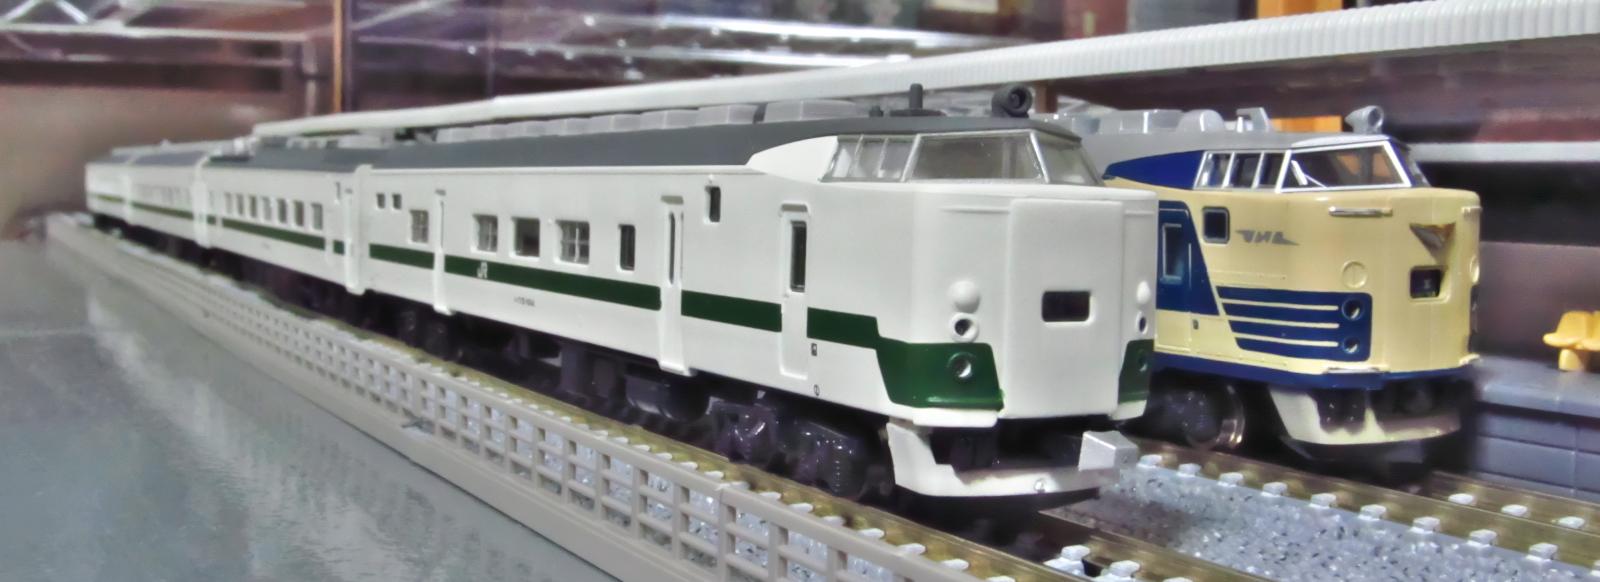 東京堂 715系1000番代